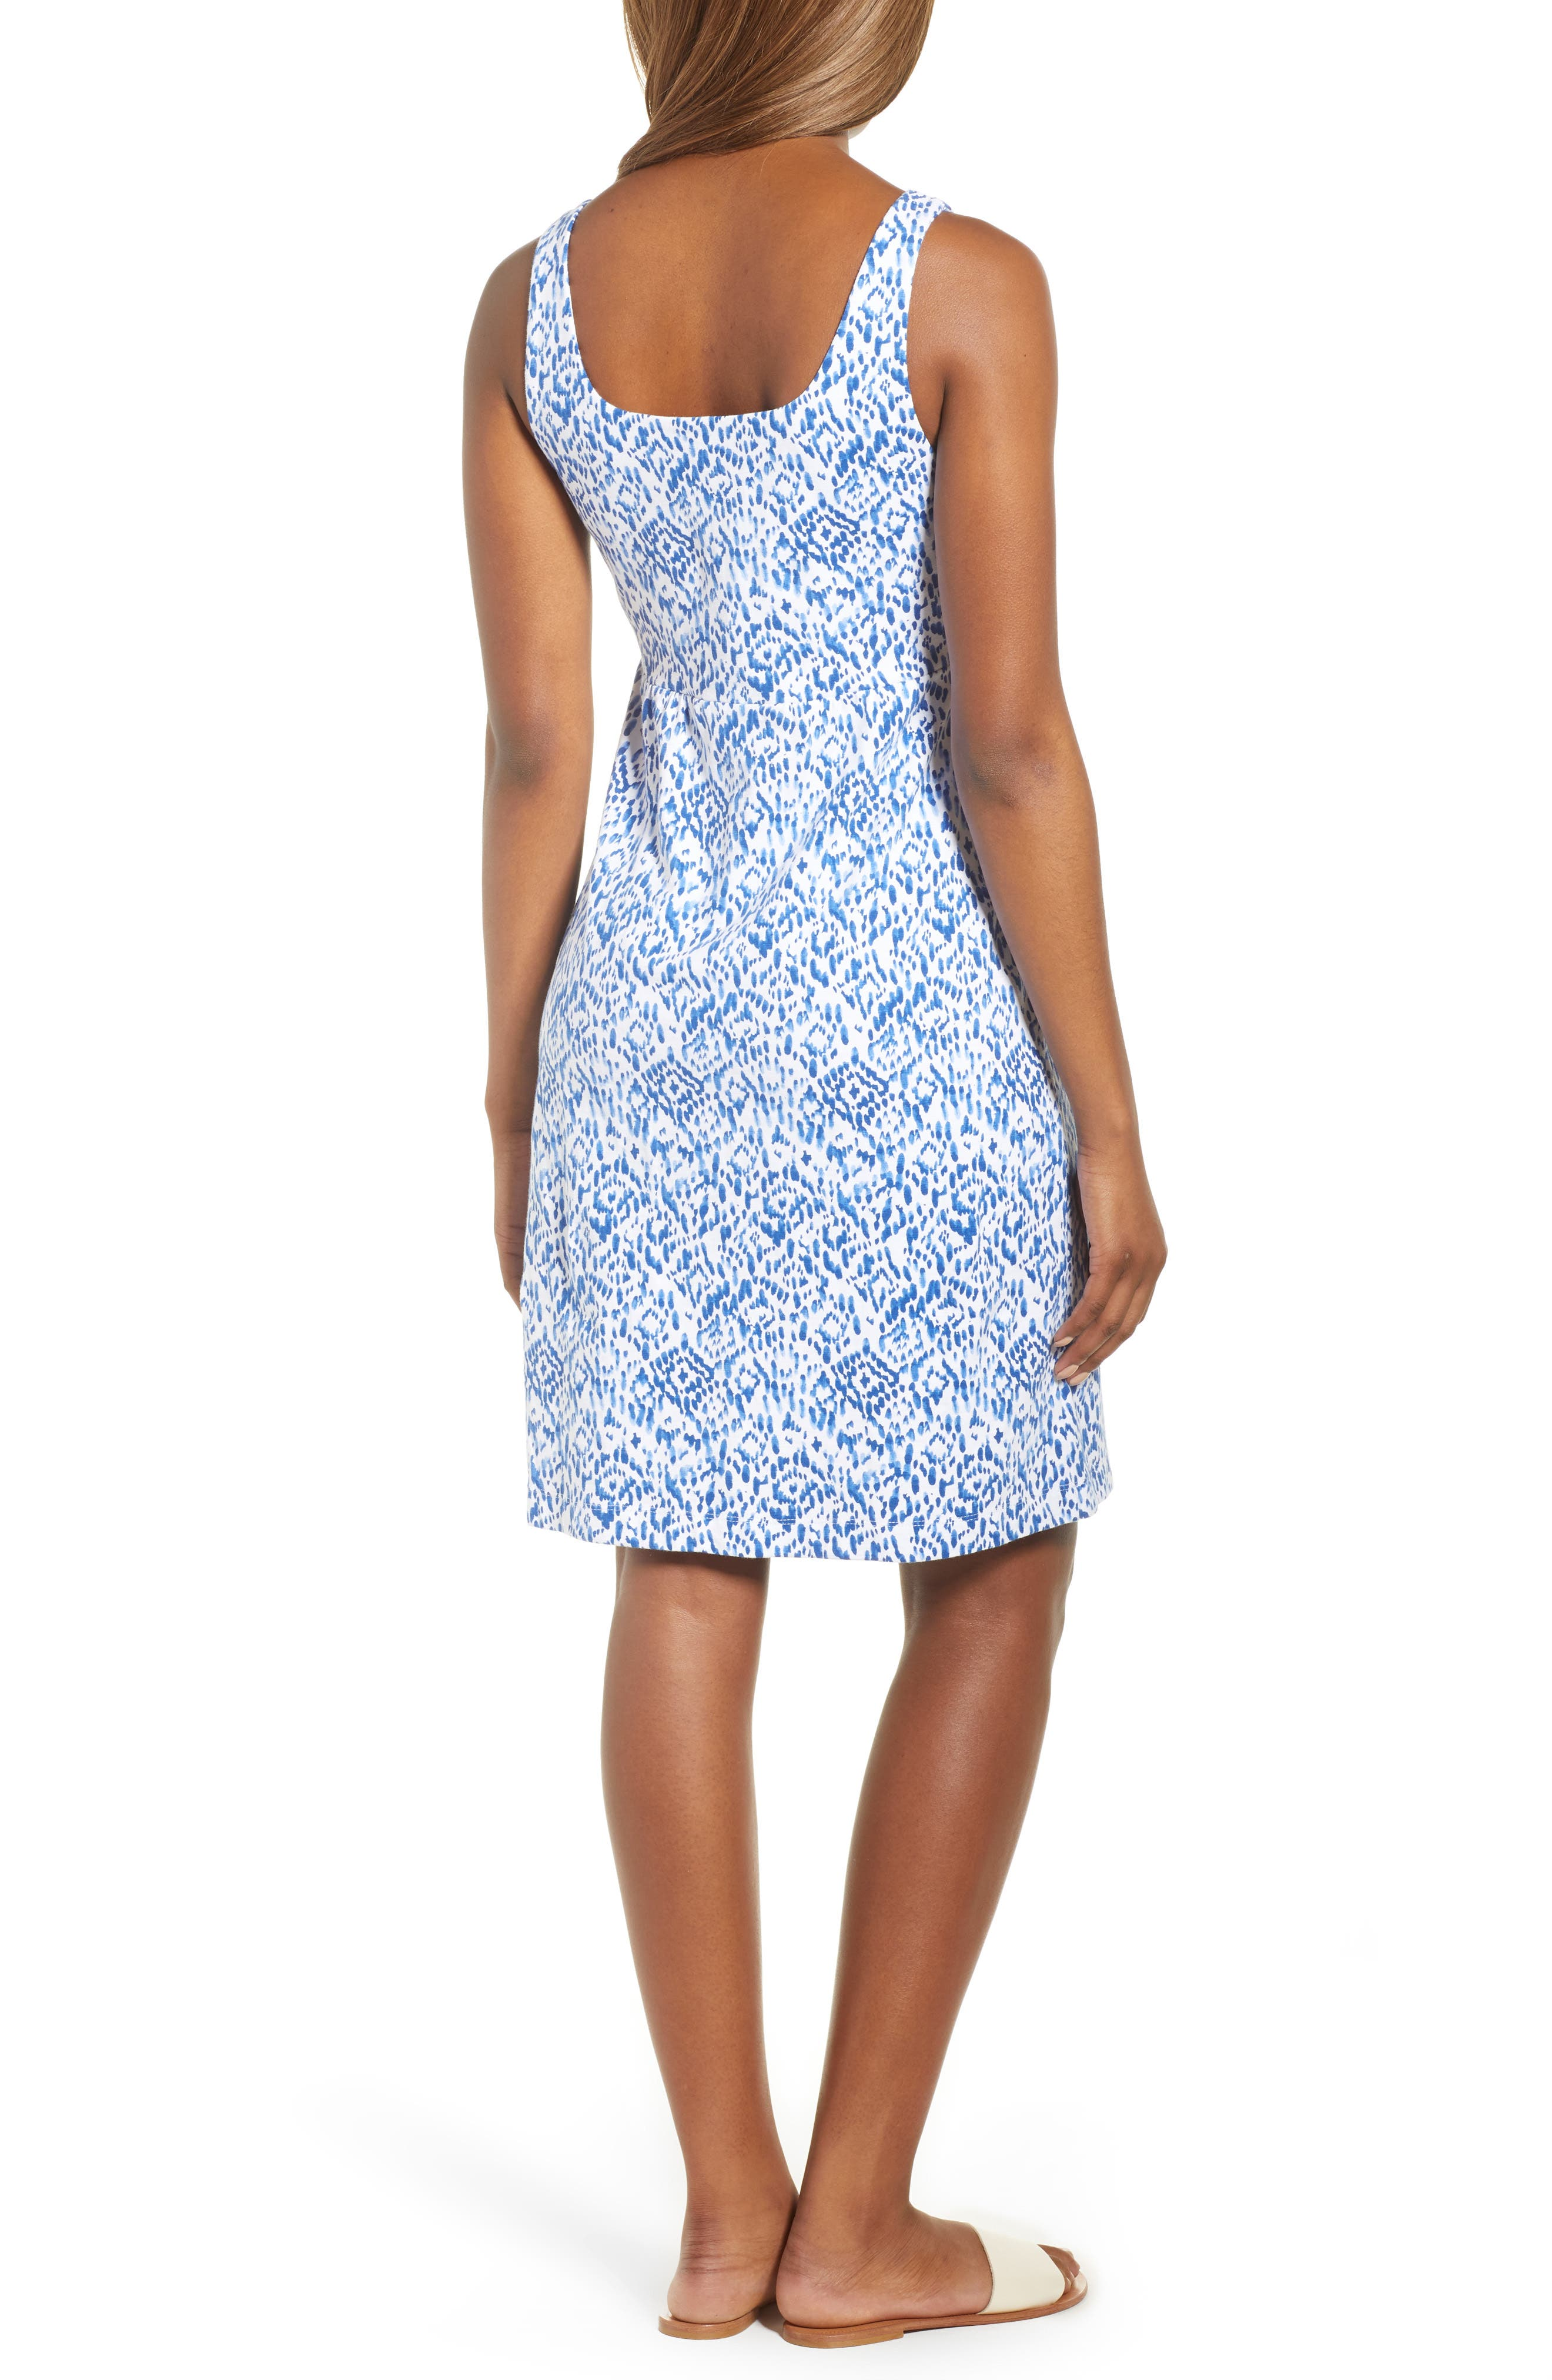 La Liorena Sleeveless Stretch Cotton Tank Dress,                             Alternate thumbnail 2, color,                             400